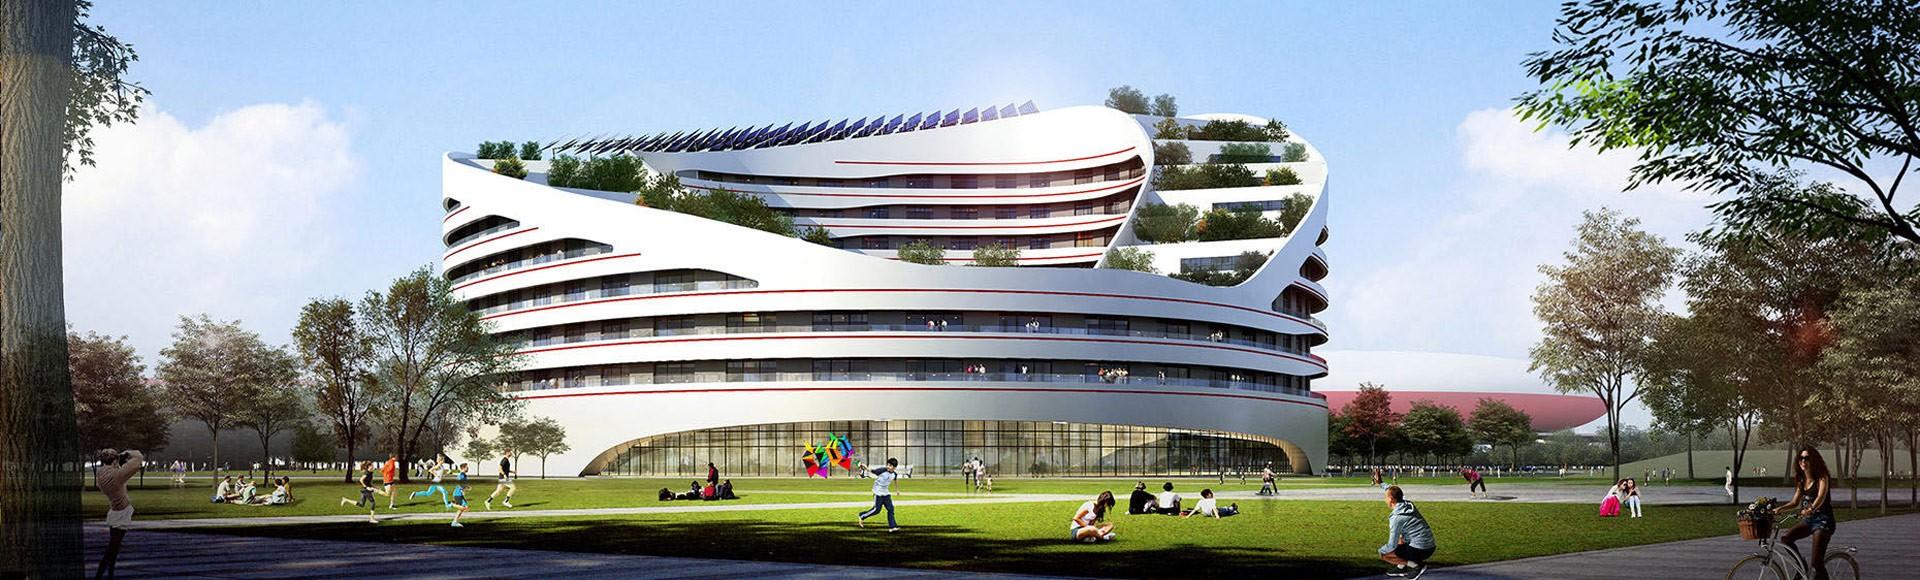 Jugend- und Sporthotel Taiyuan Shanxi